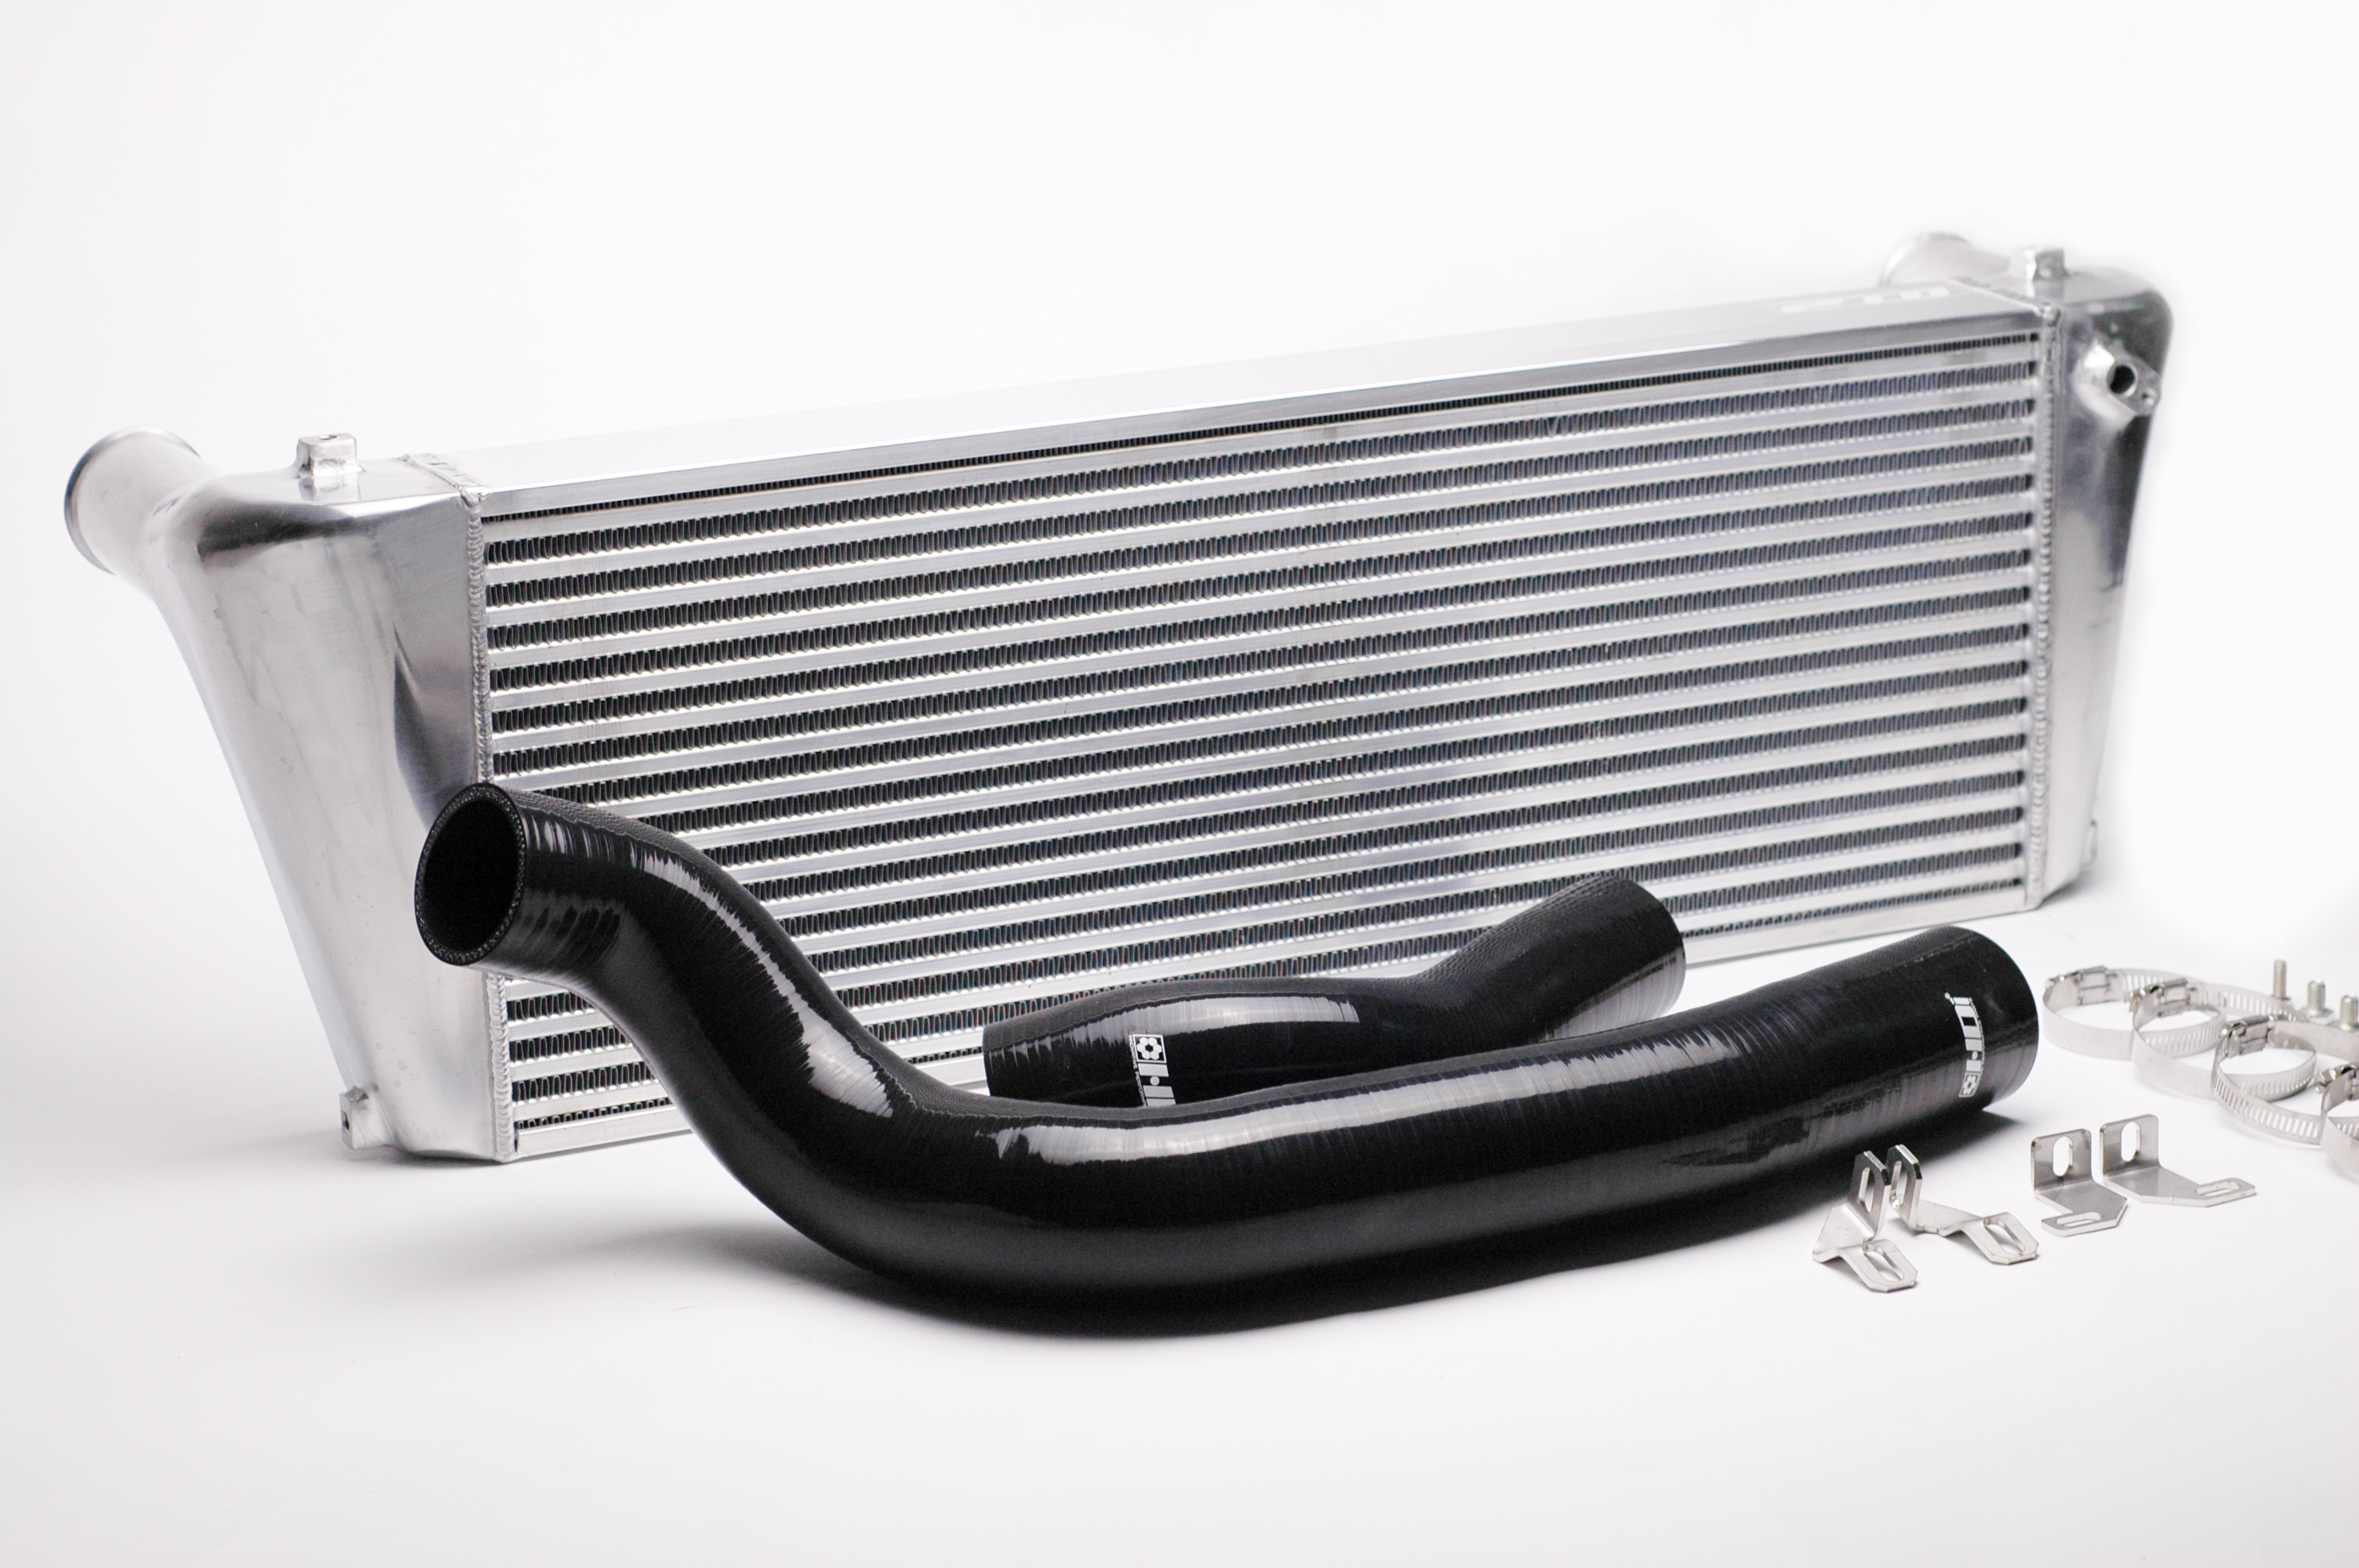 Ford Ranger - Mazda BT50 intercooler kit (3).jpg